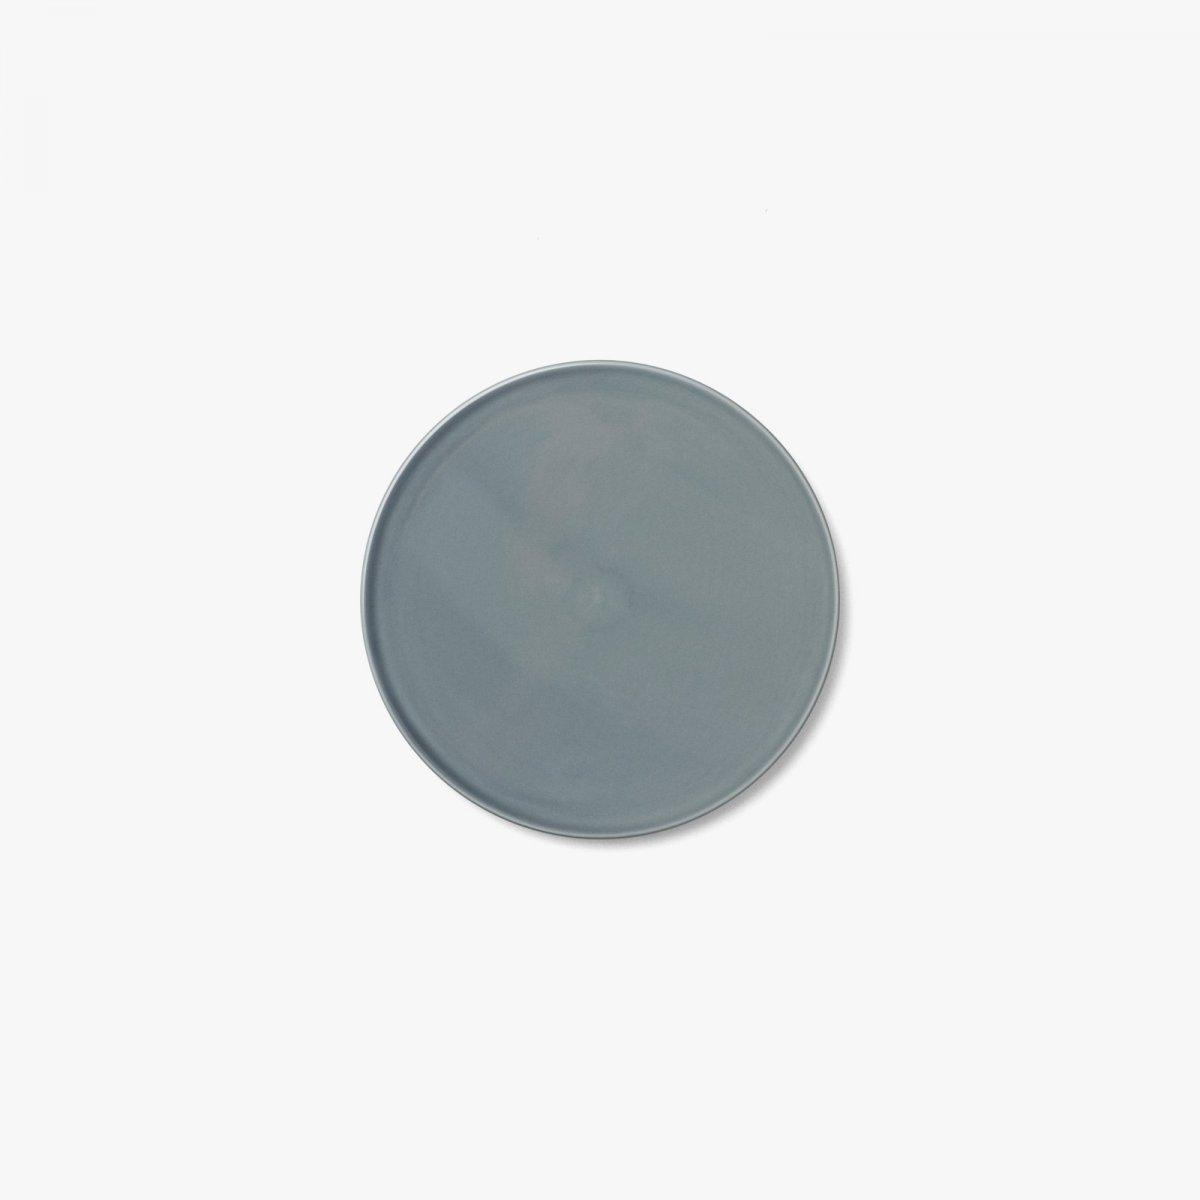 New Norm Plate/Lid, Ø 17.5 cm, ocean.